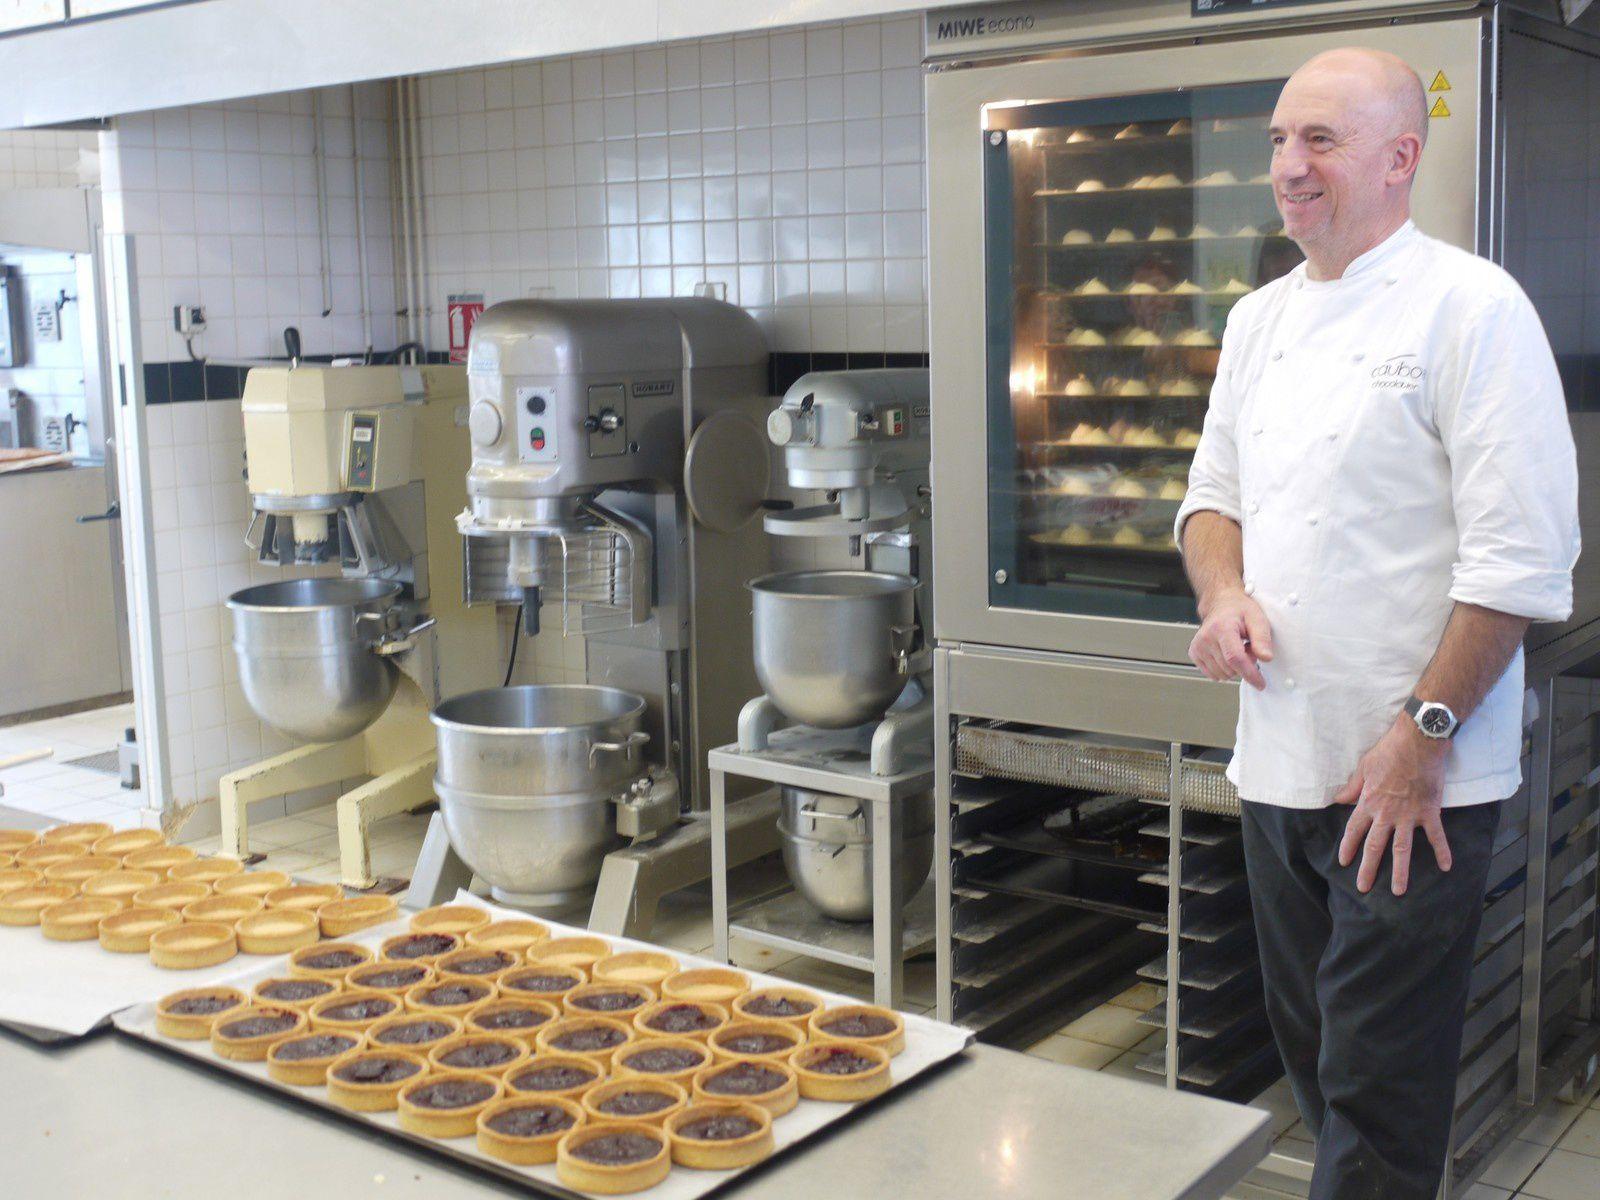 Franck Daubos, le maître chocolatier